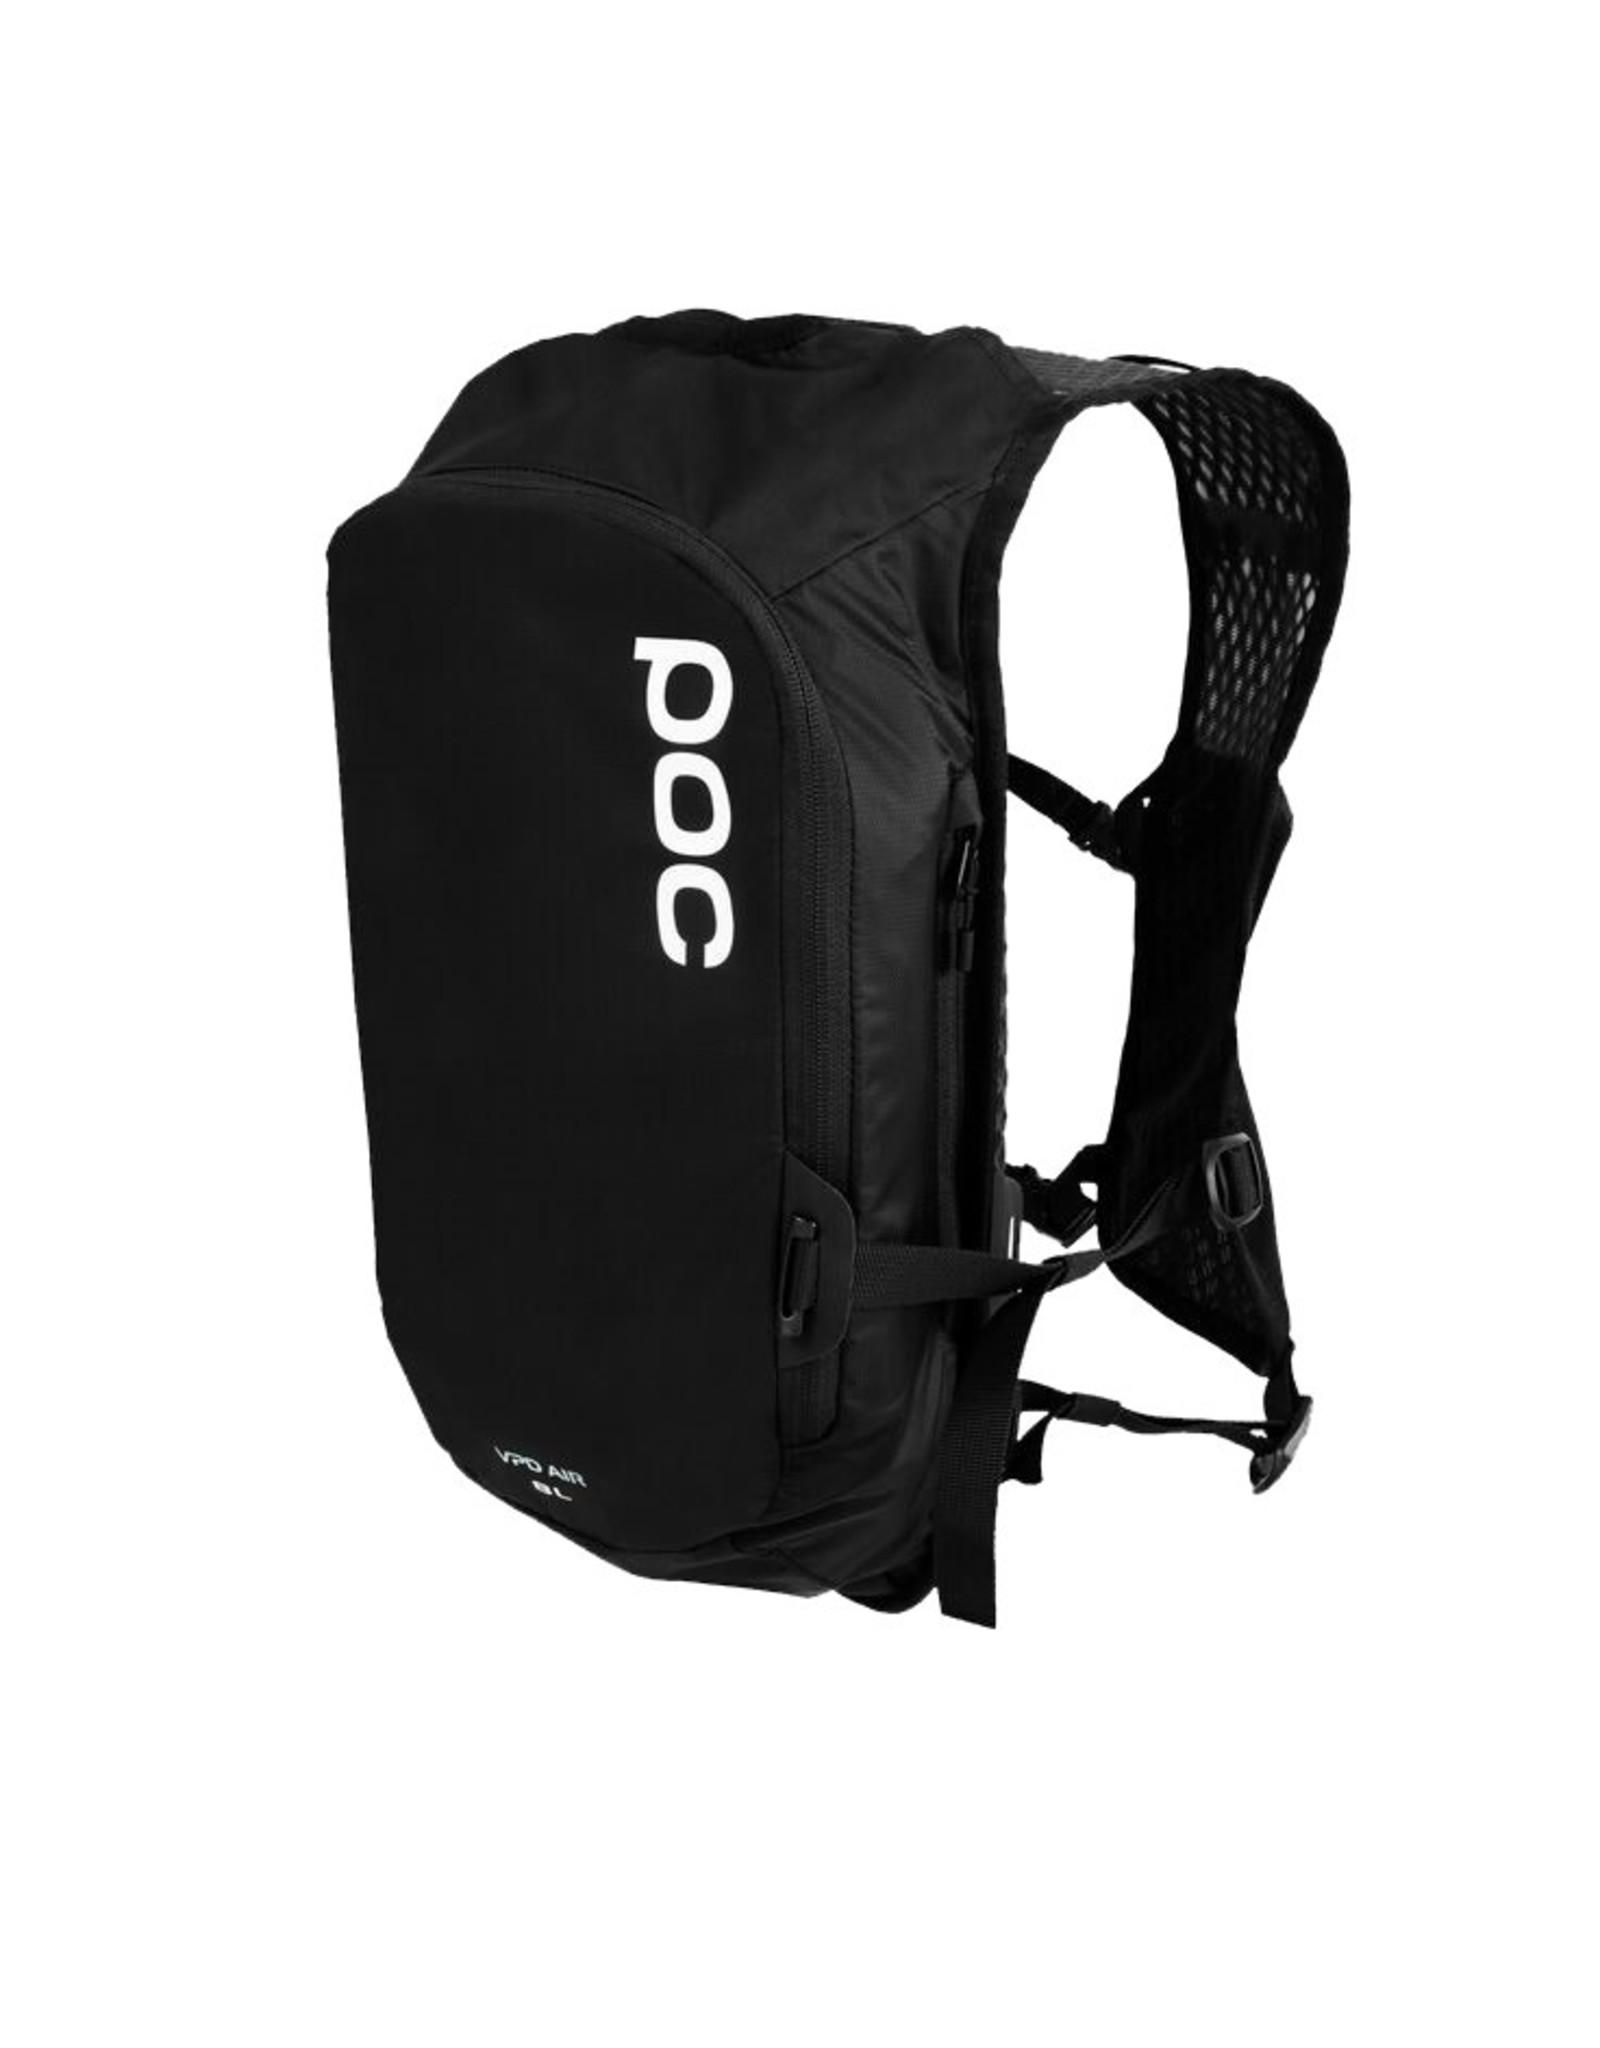 POC Water bag POC Spine VPD Air 8 black ura